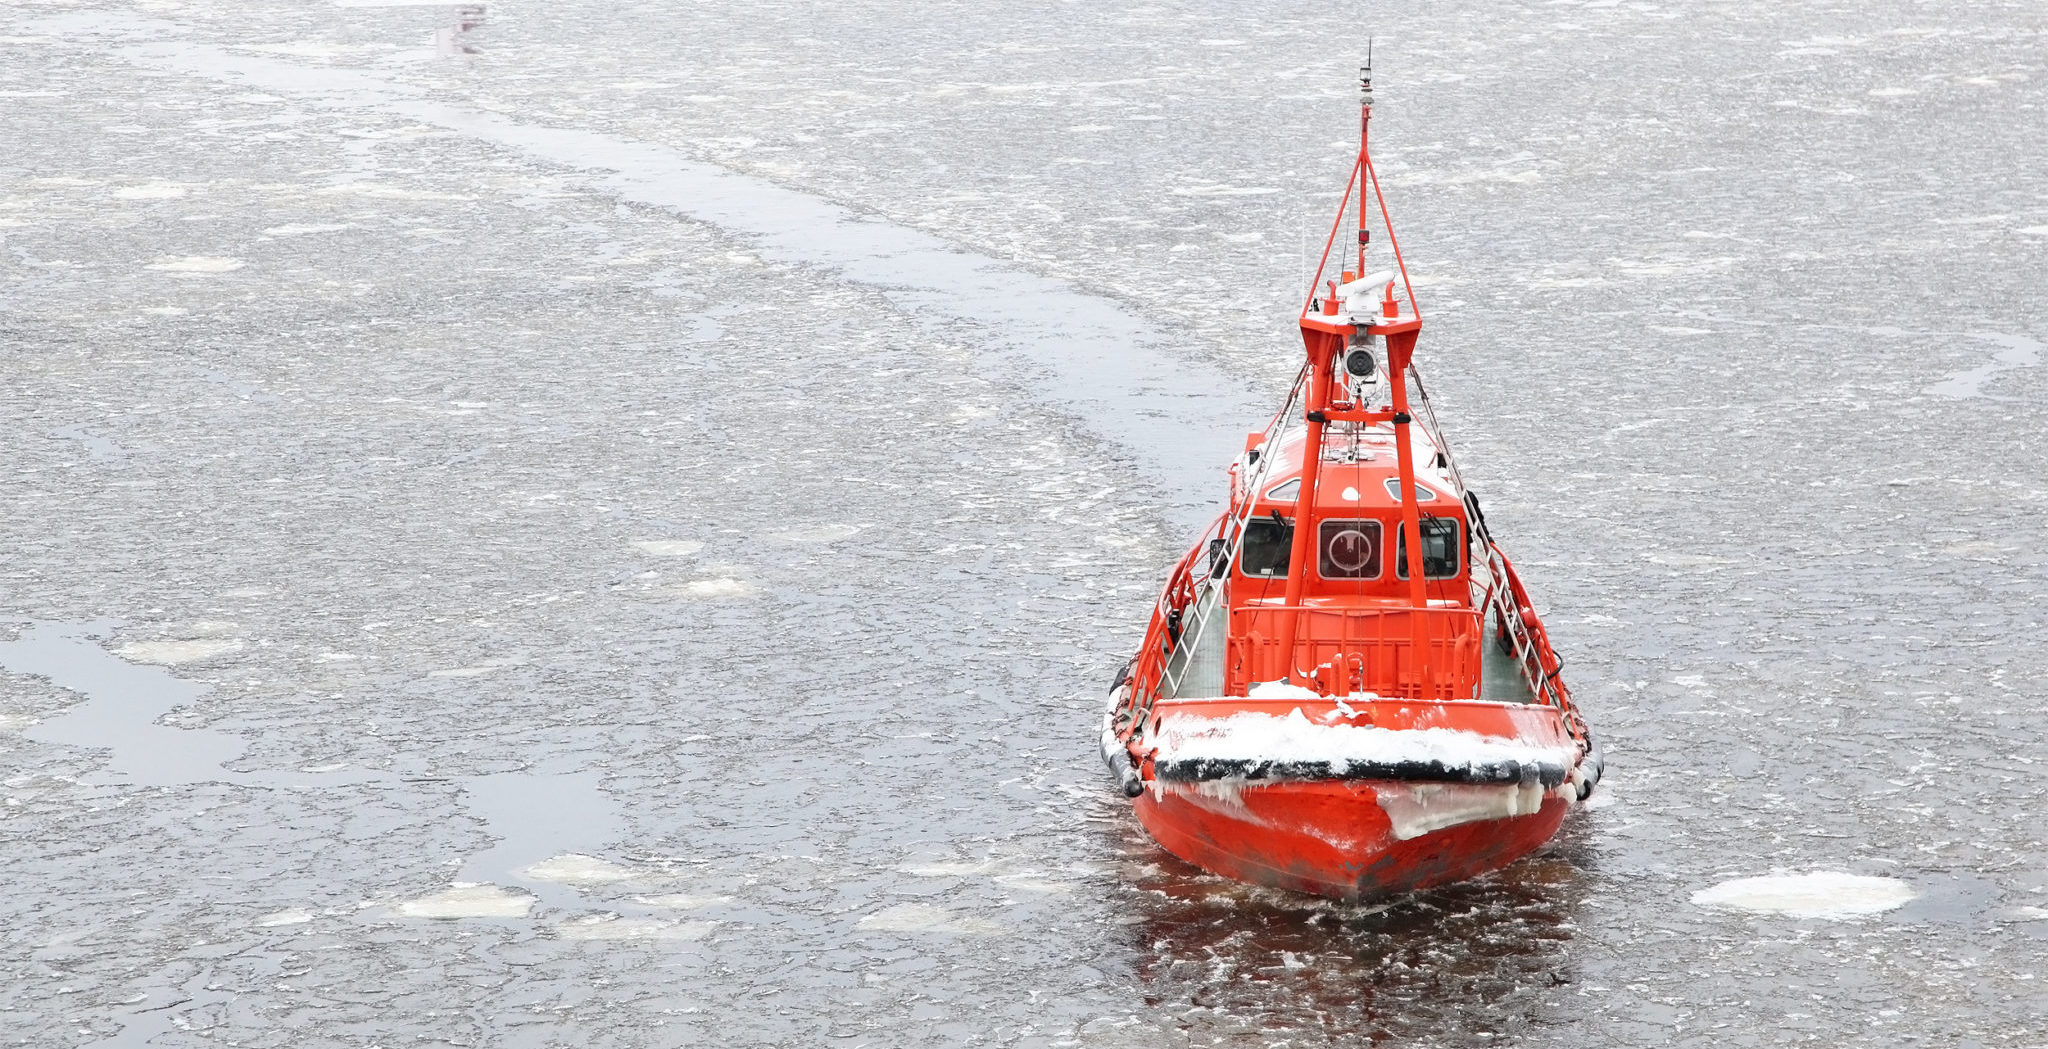 Defending Arctic Regions: How Prepared Is the US Coast Guard?